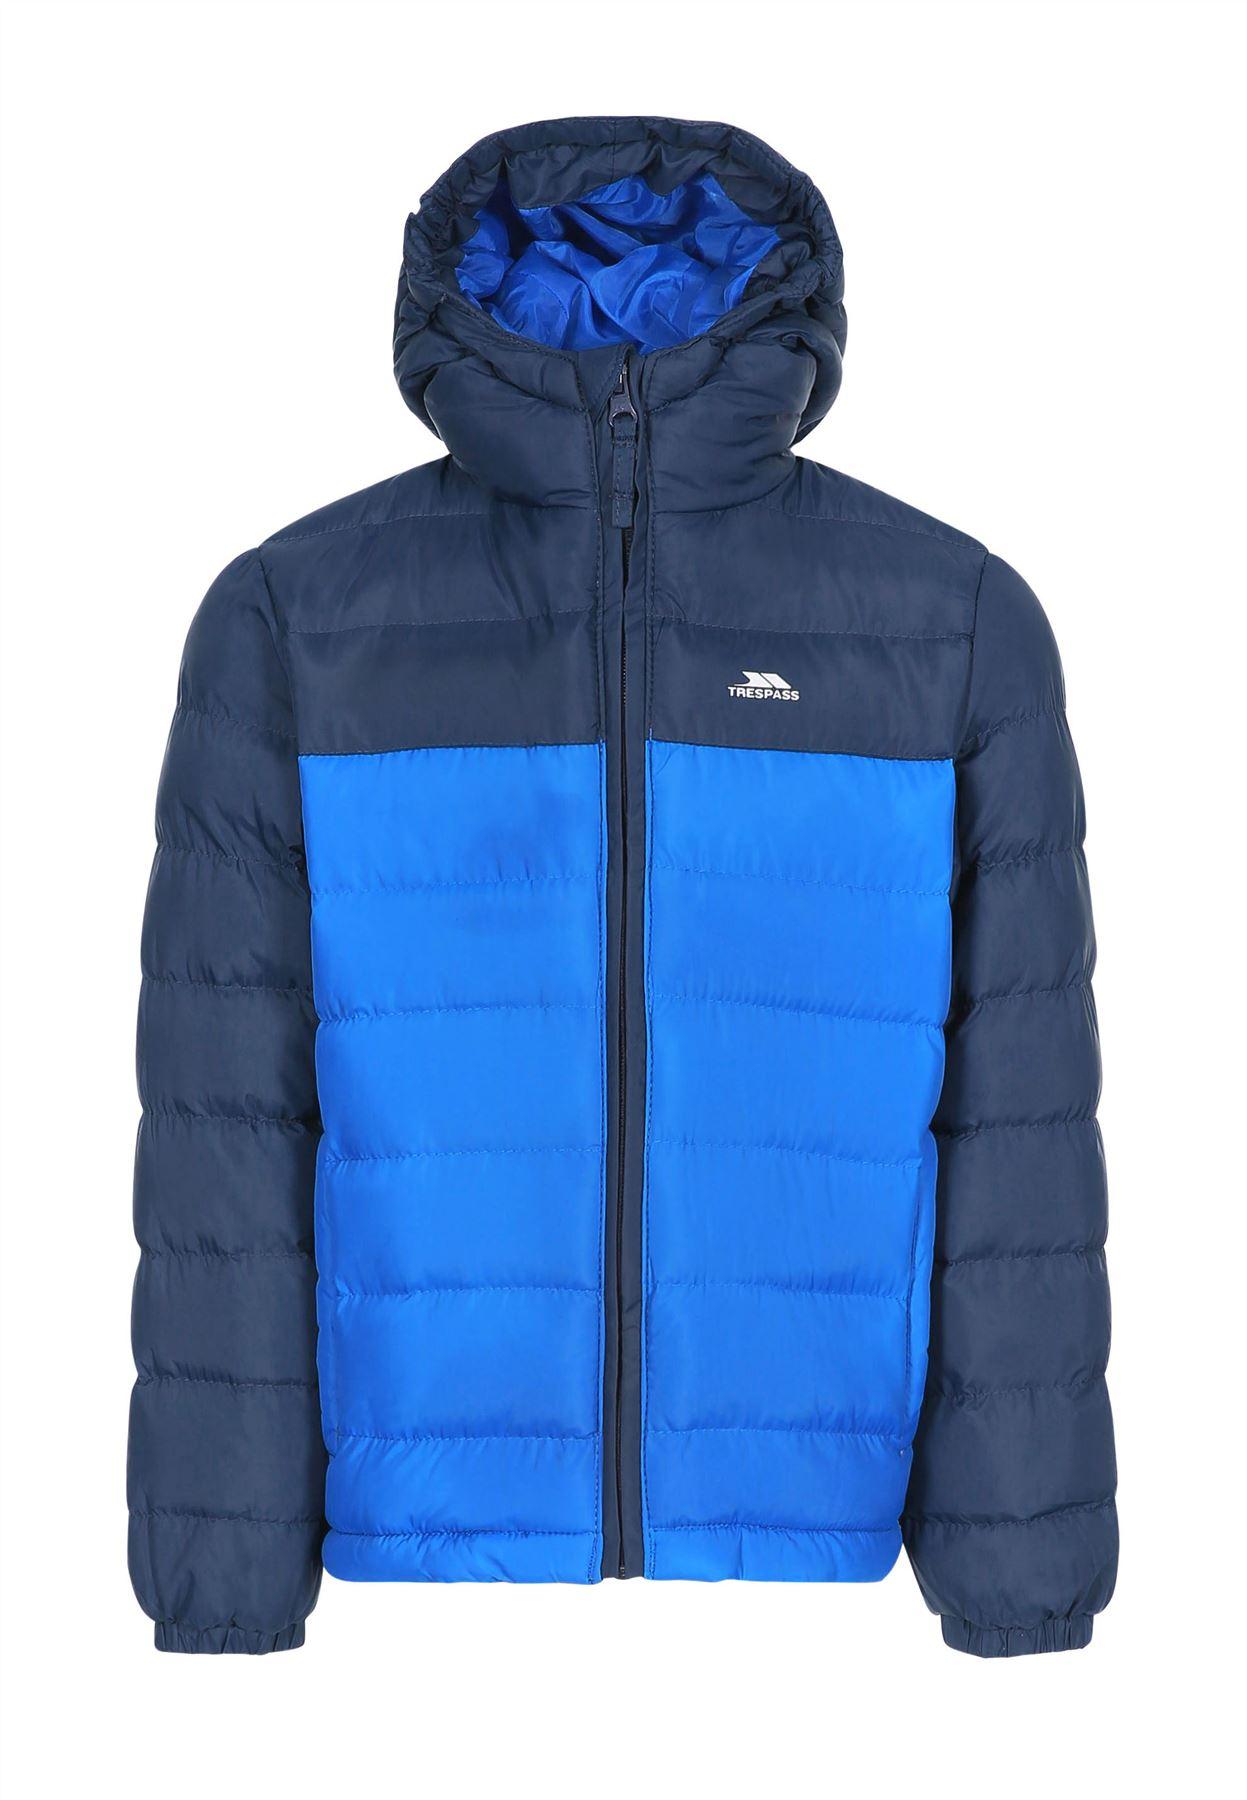 Trespass Oskar Kids Quilted Jacket Hooded Coat